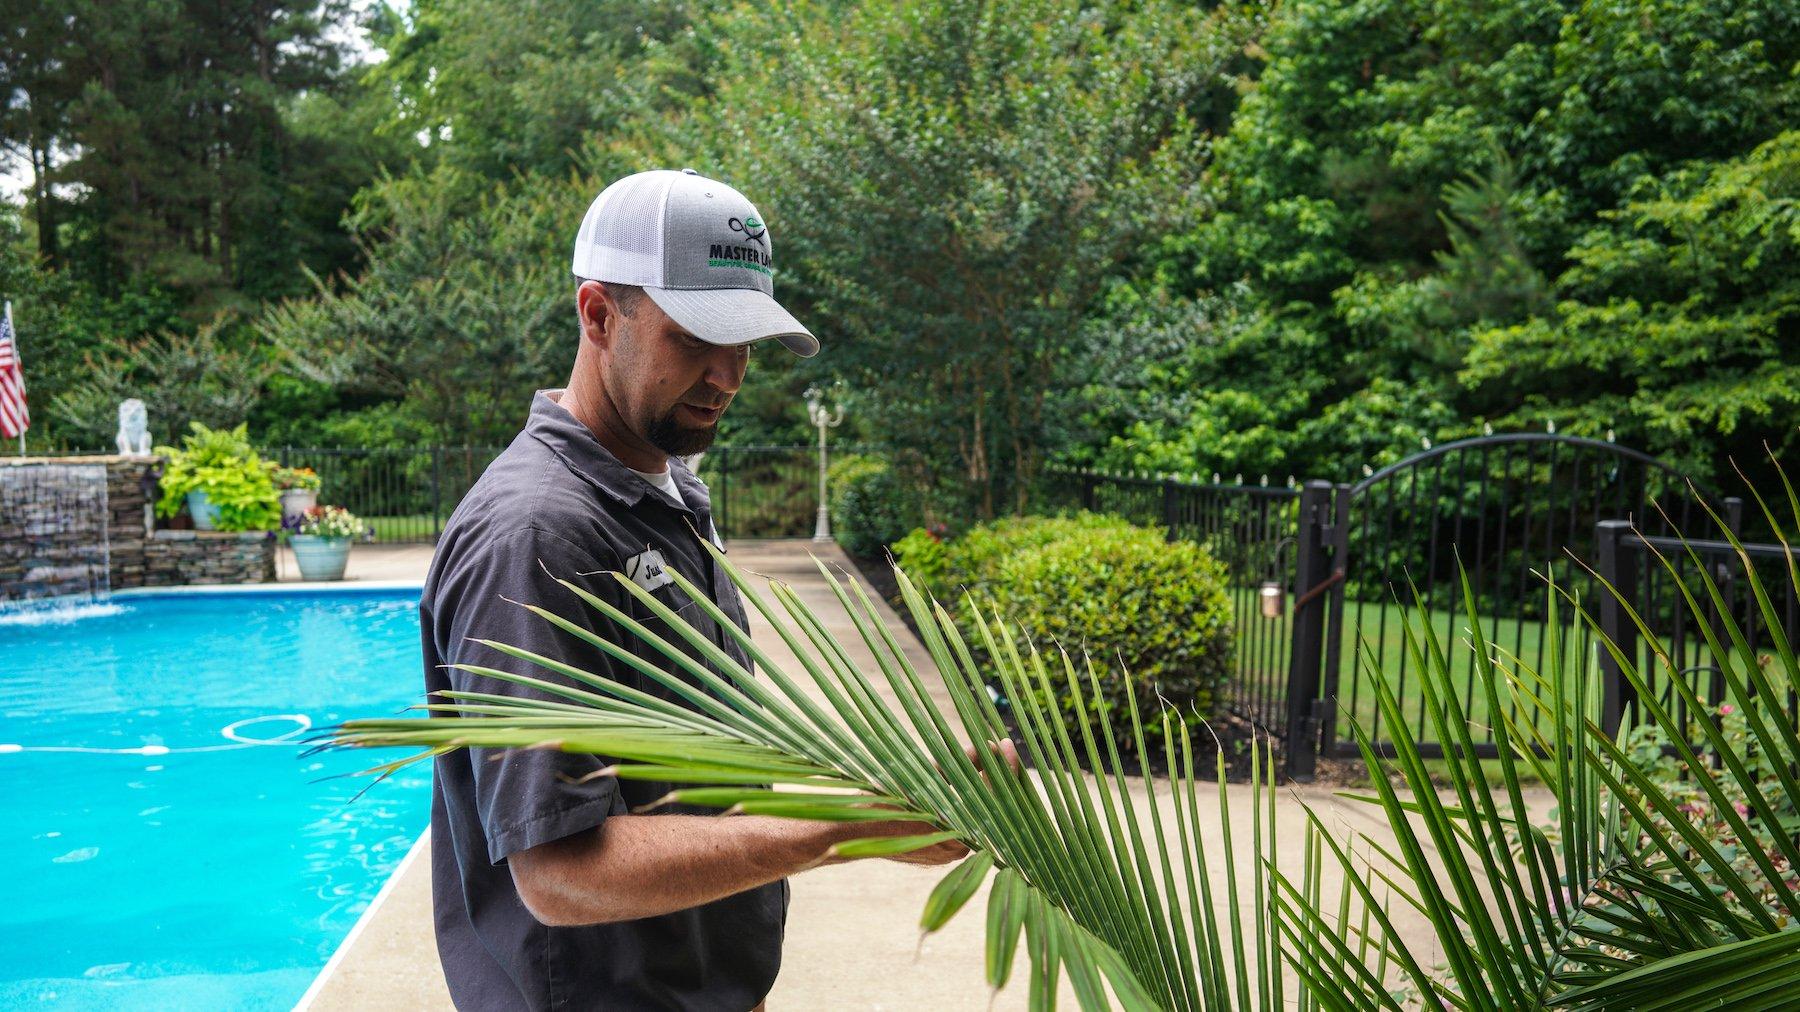 Plant health care technician inspecting plants